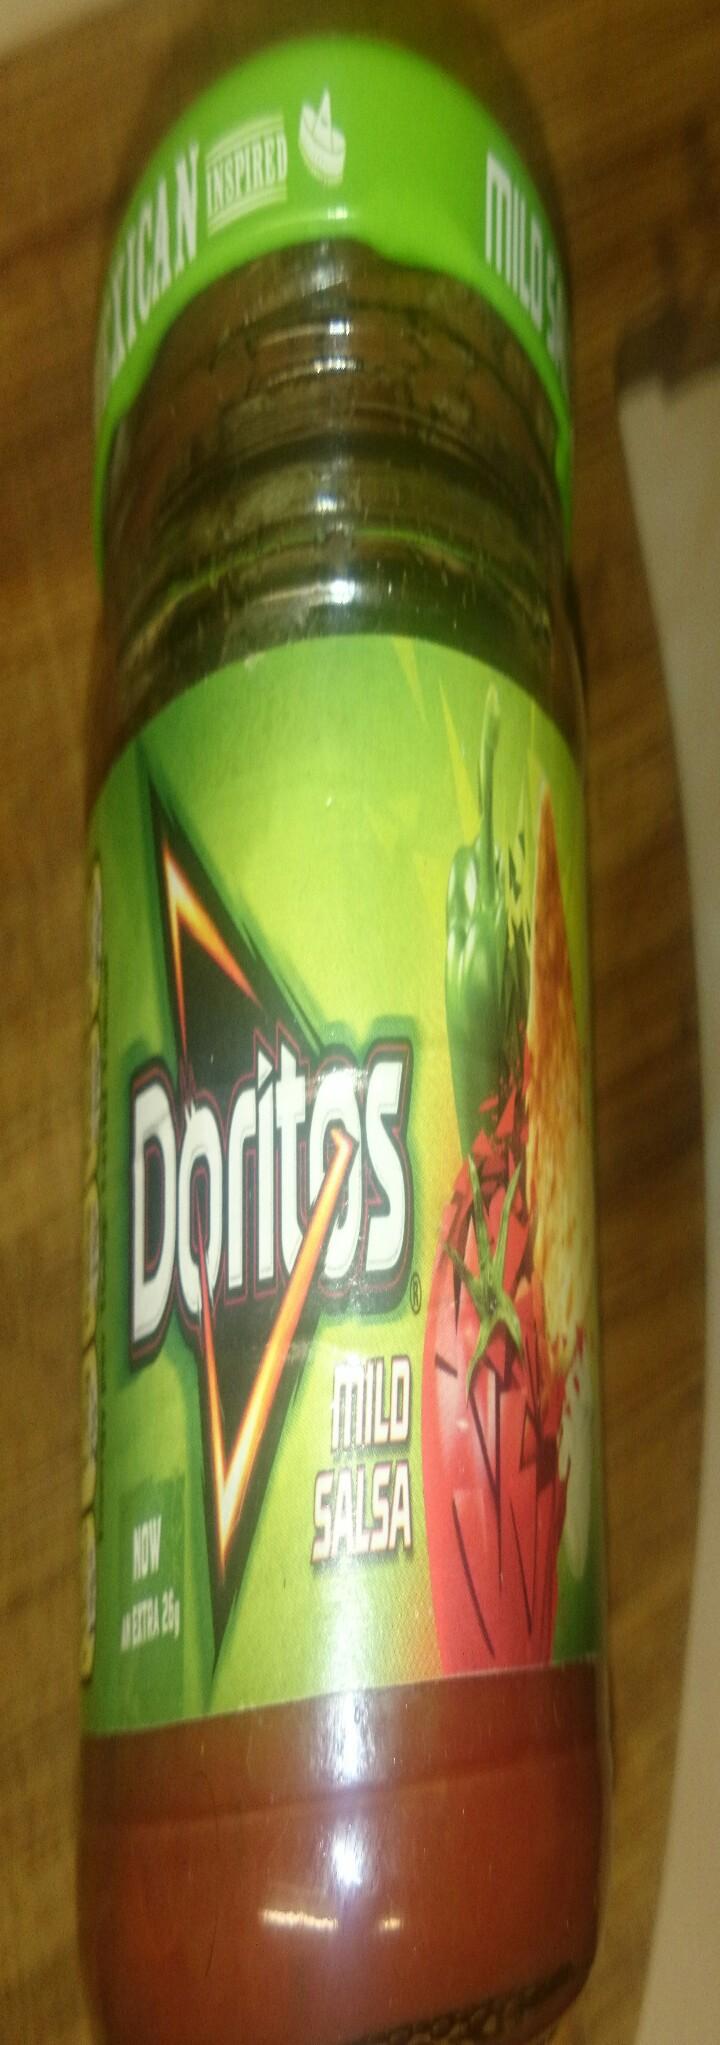 Doritos mild salsa